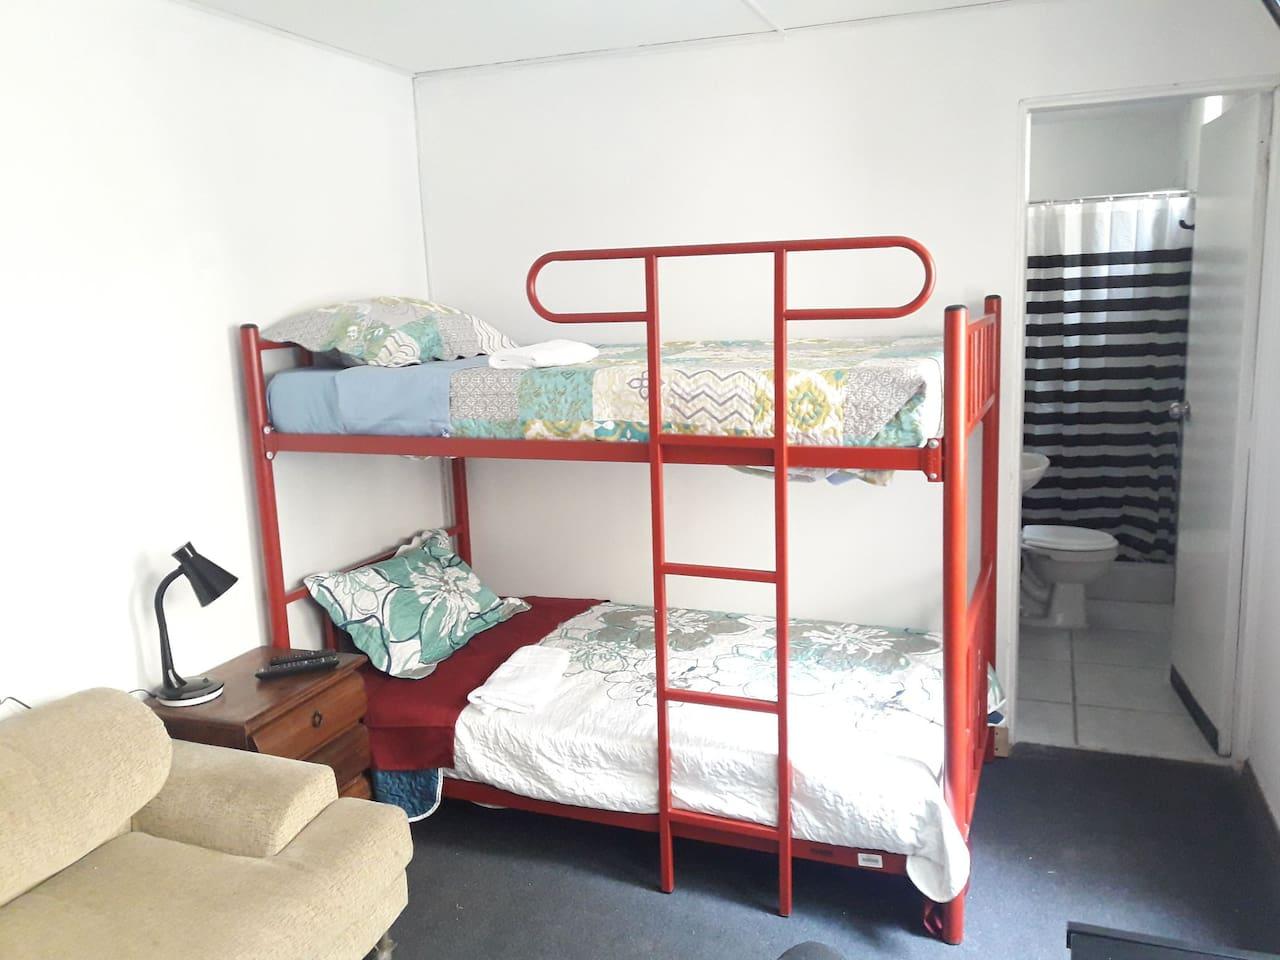 Comoda cama camarote de 1.5 plazas cada cama.